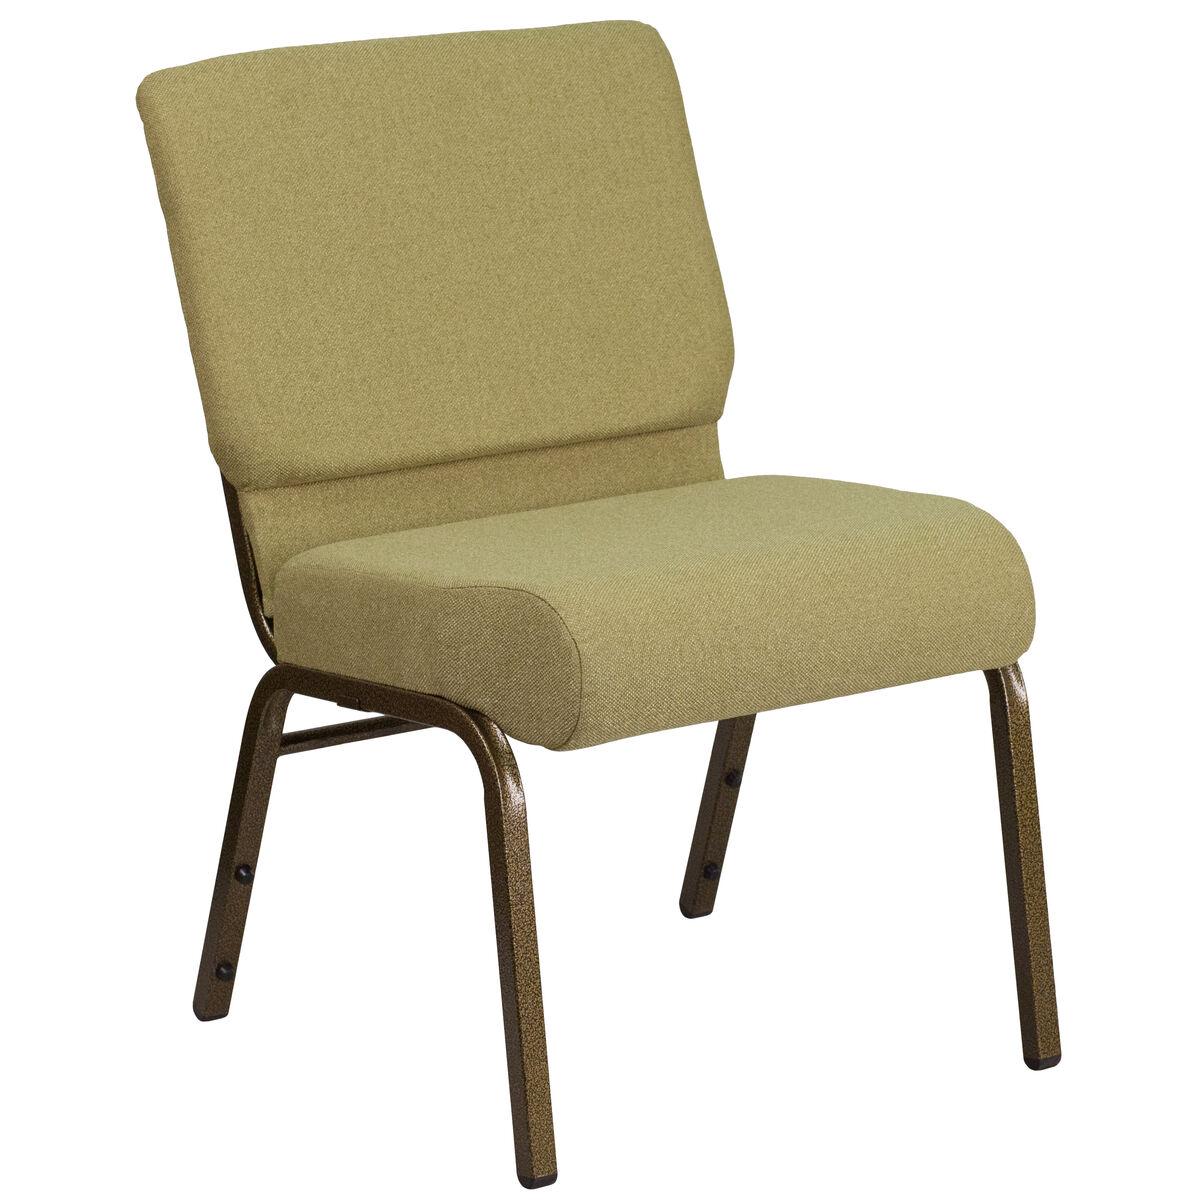 Moss Green Fabric Church Chair FD-CH0221-4-GV-GN-GG